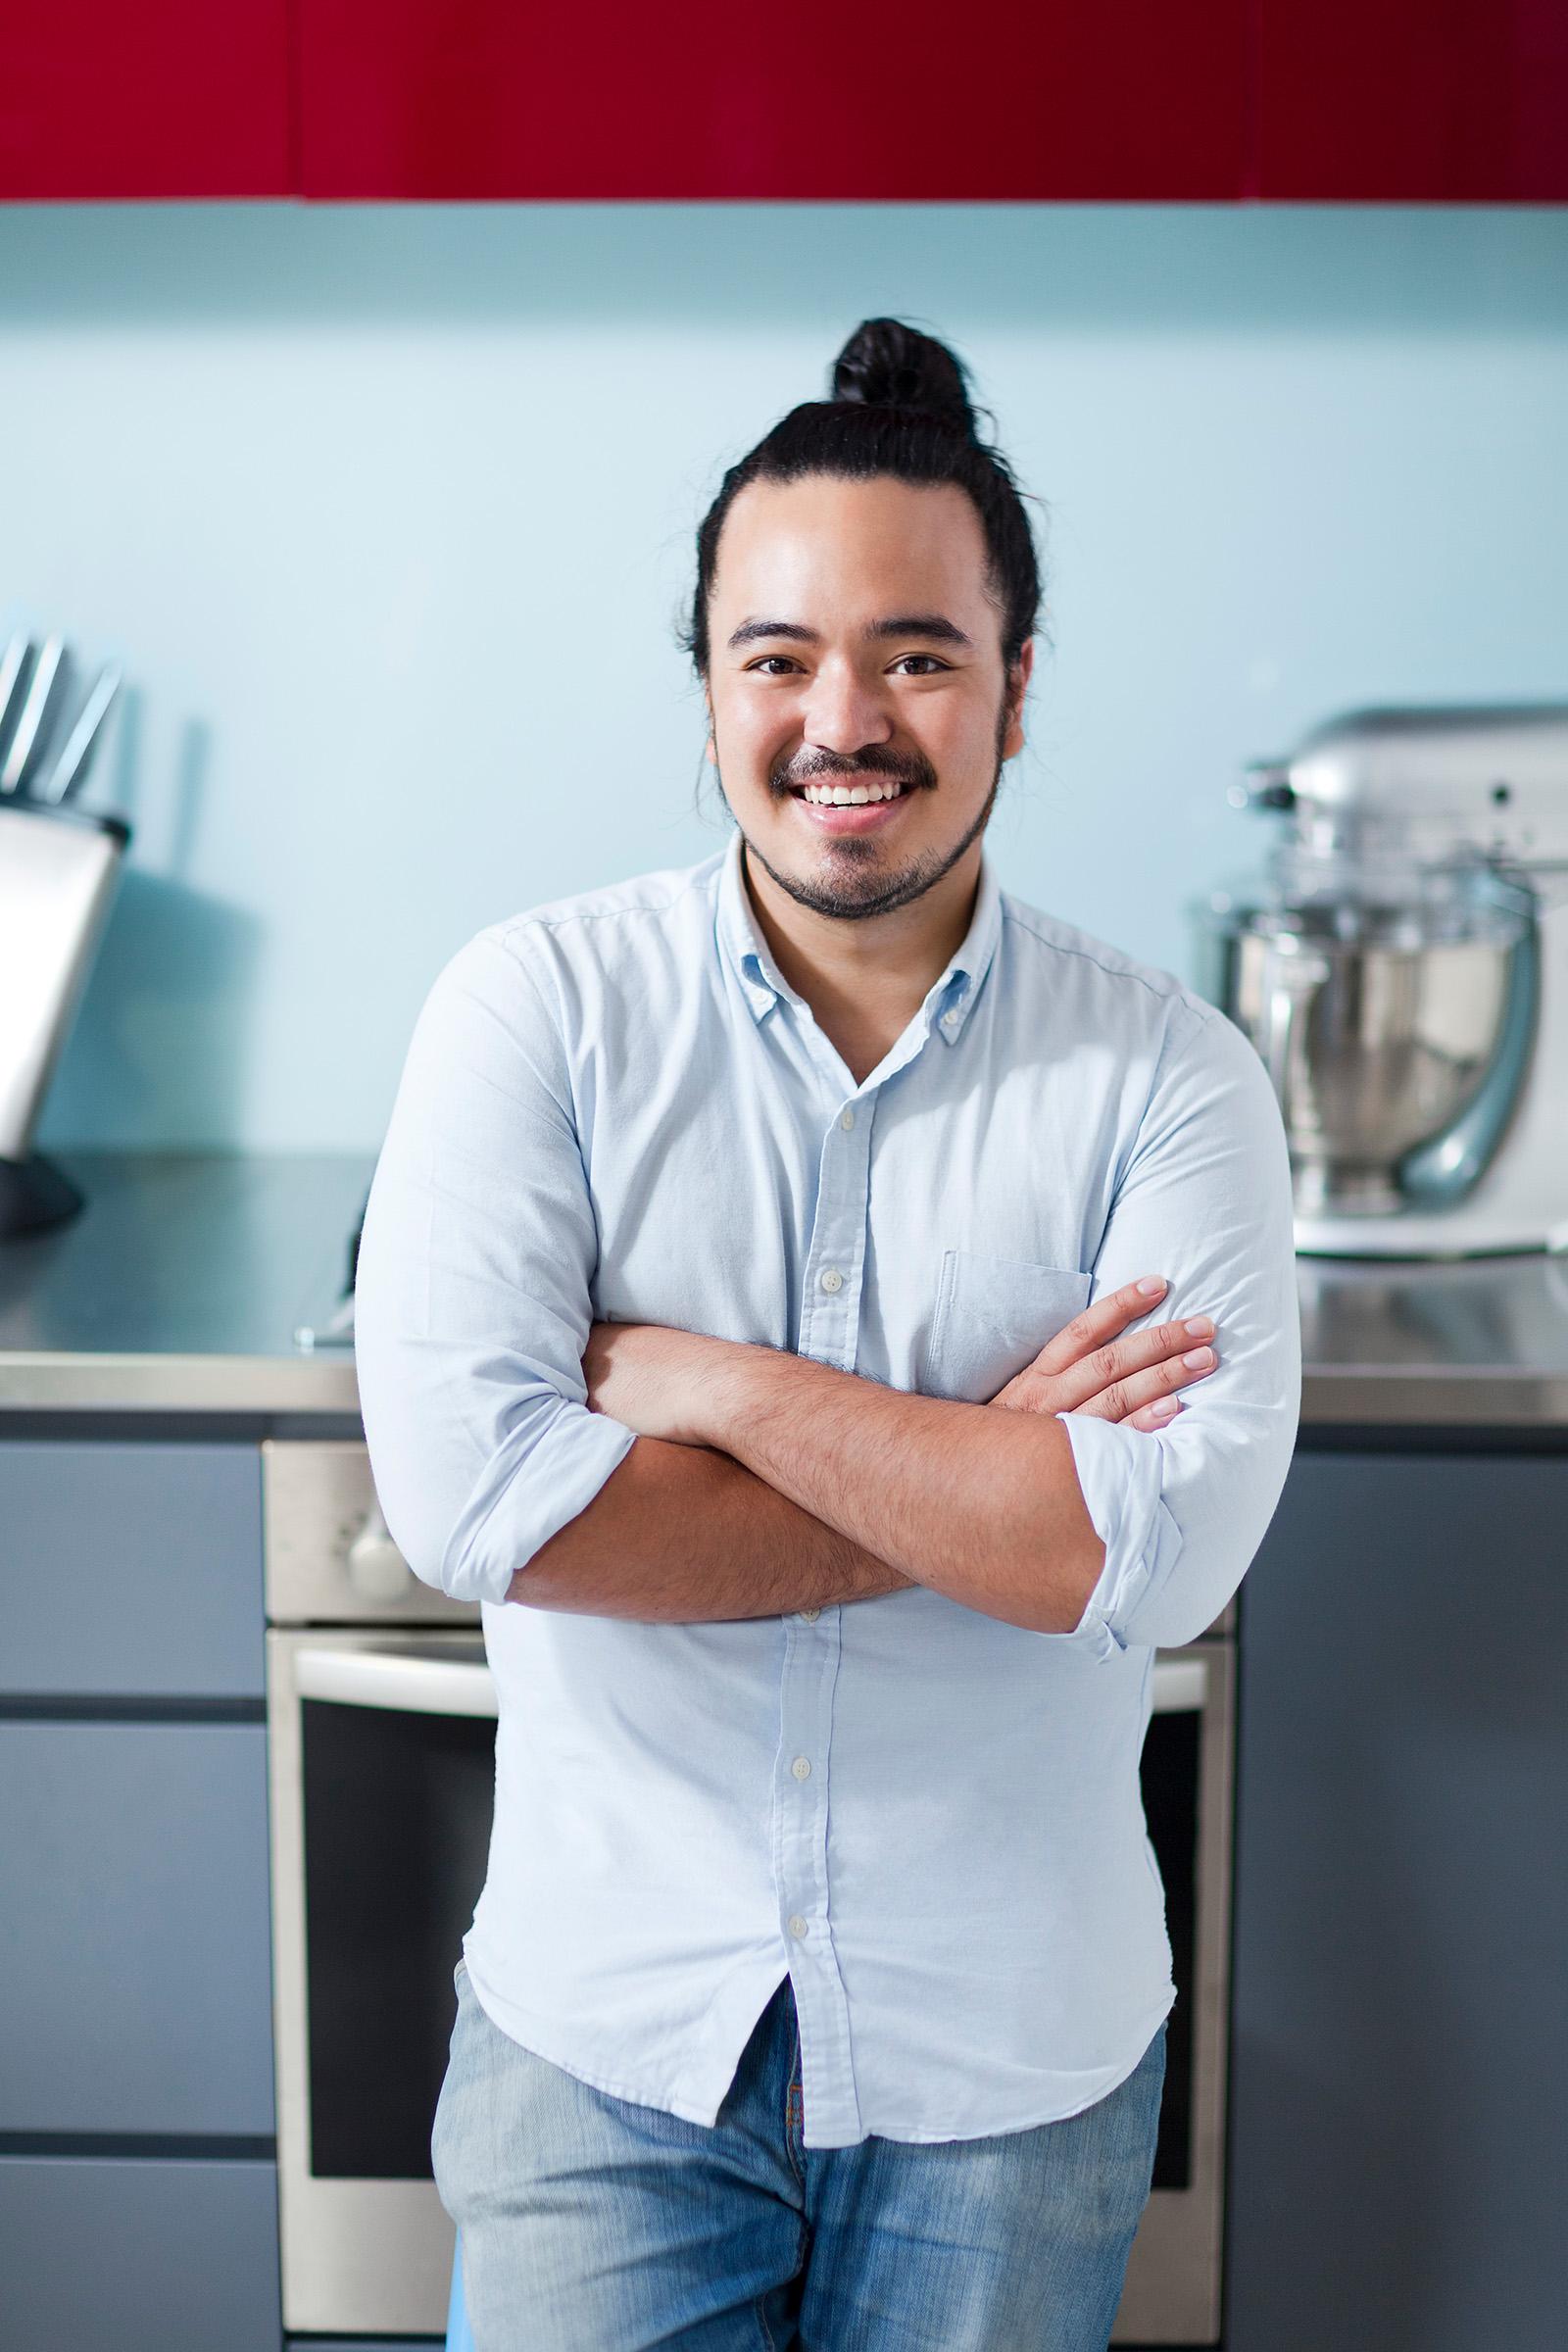 Advertising editorial photography Adam Liaw Malaysian Australian cook MasterChef